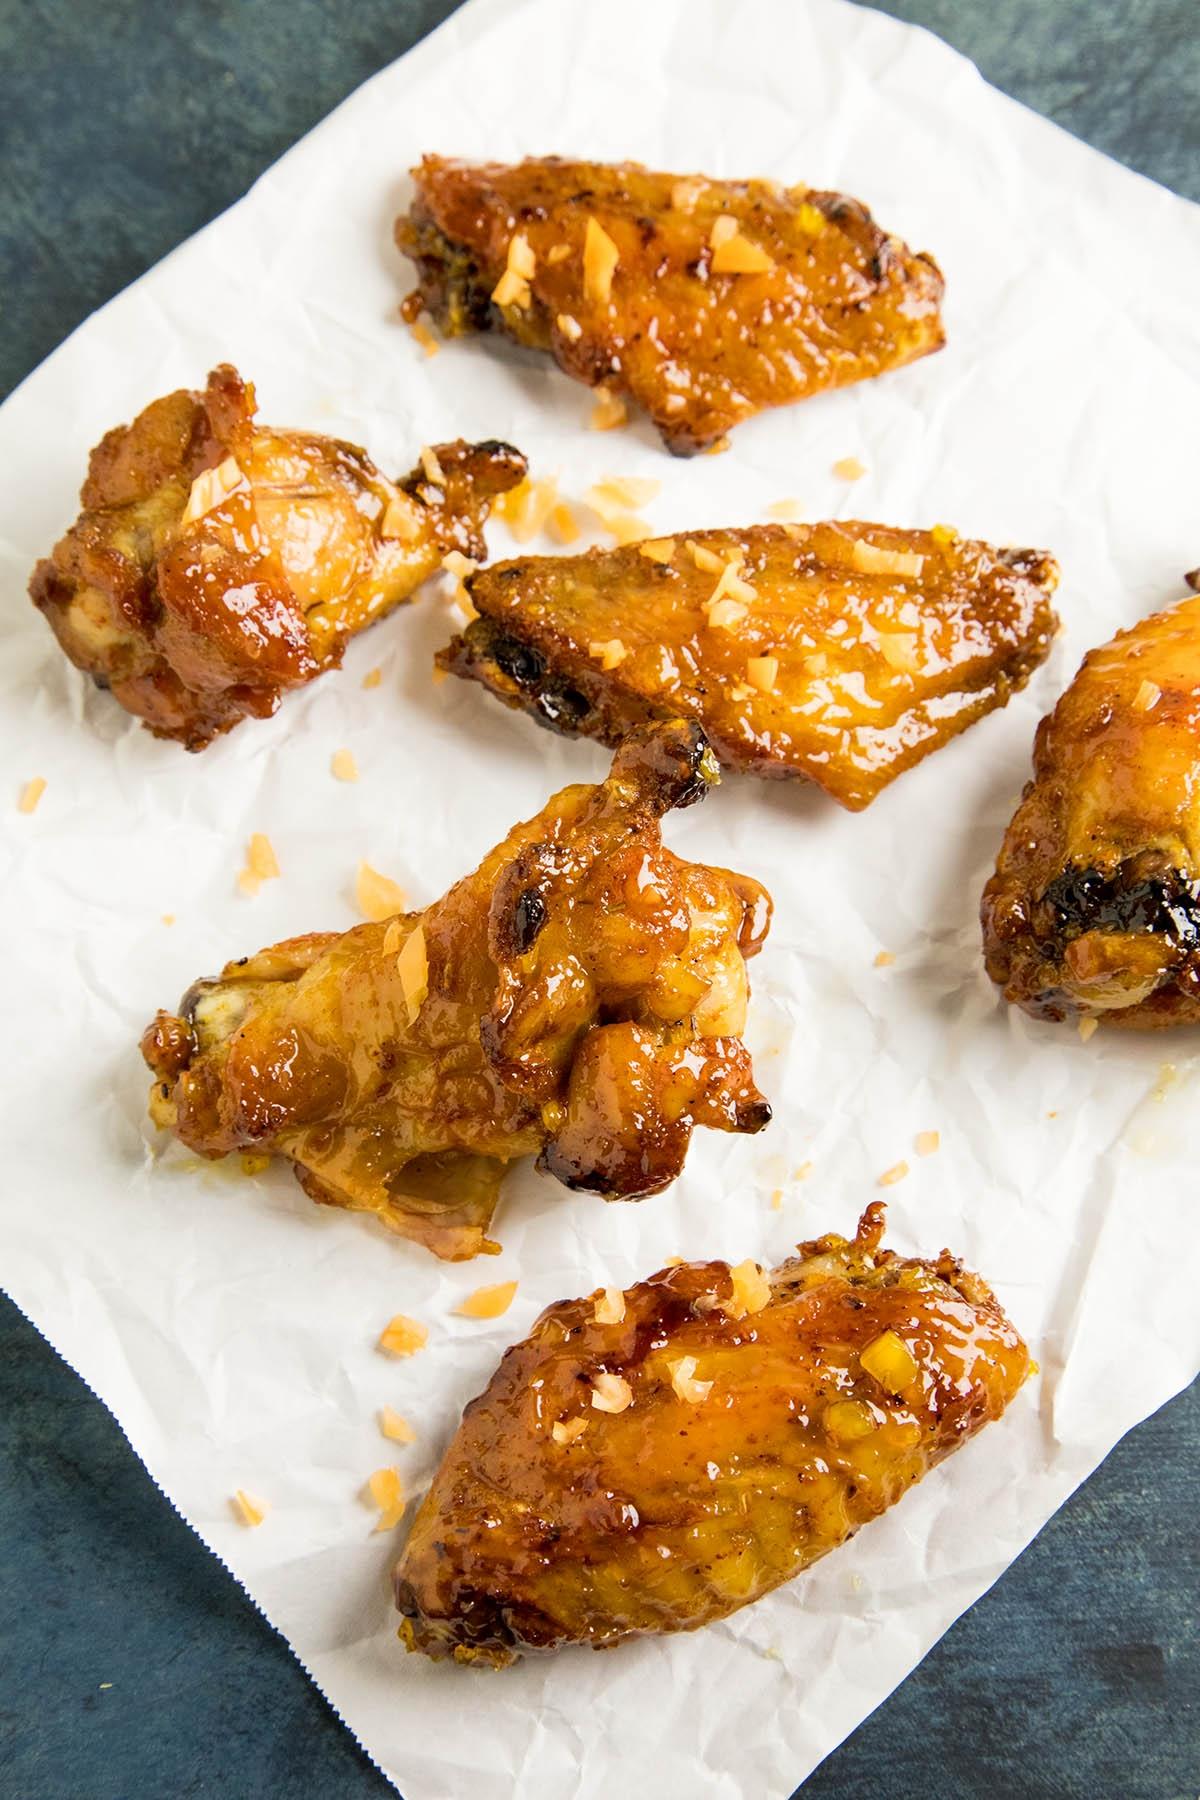 Sticky Habanero Glazed Chicken Wings